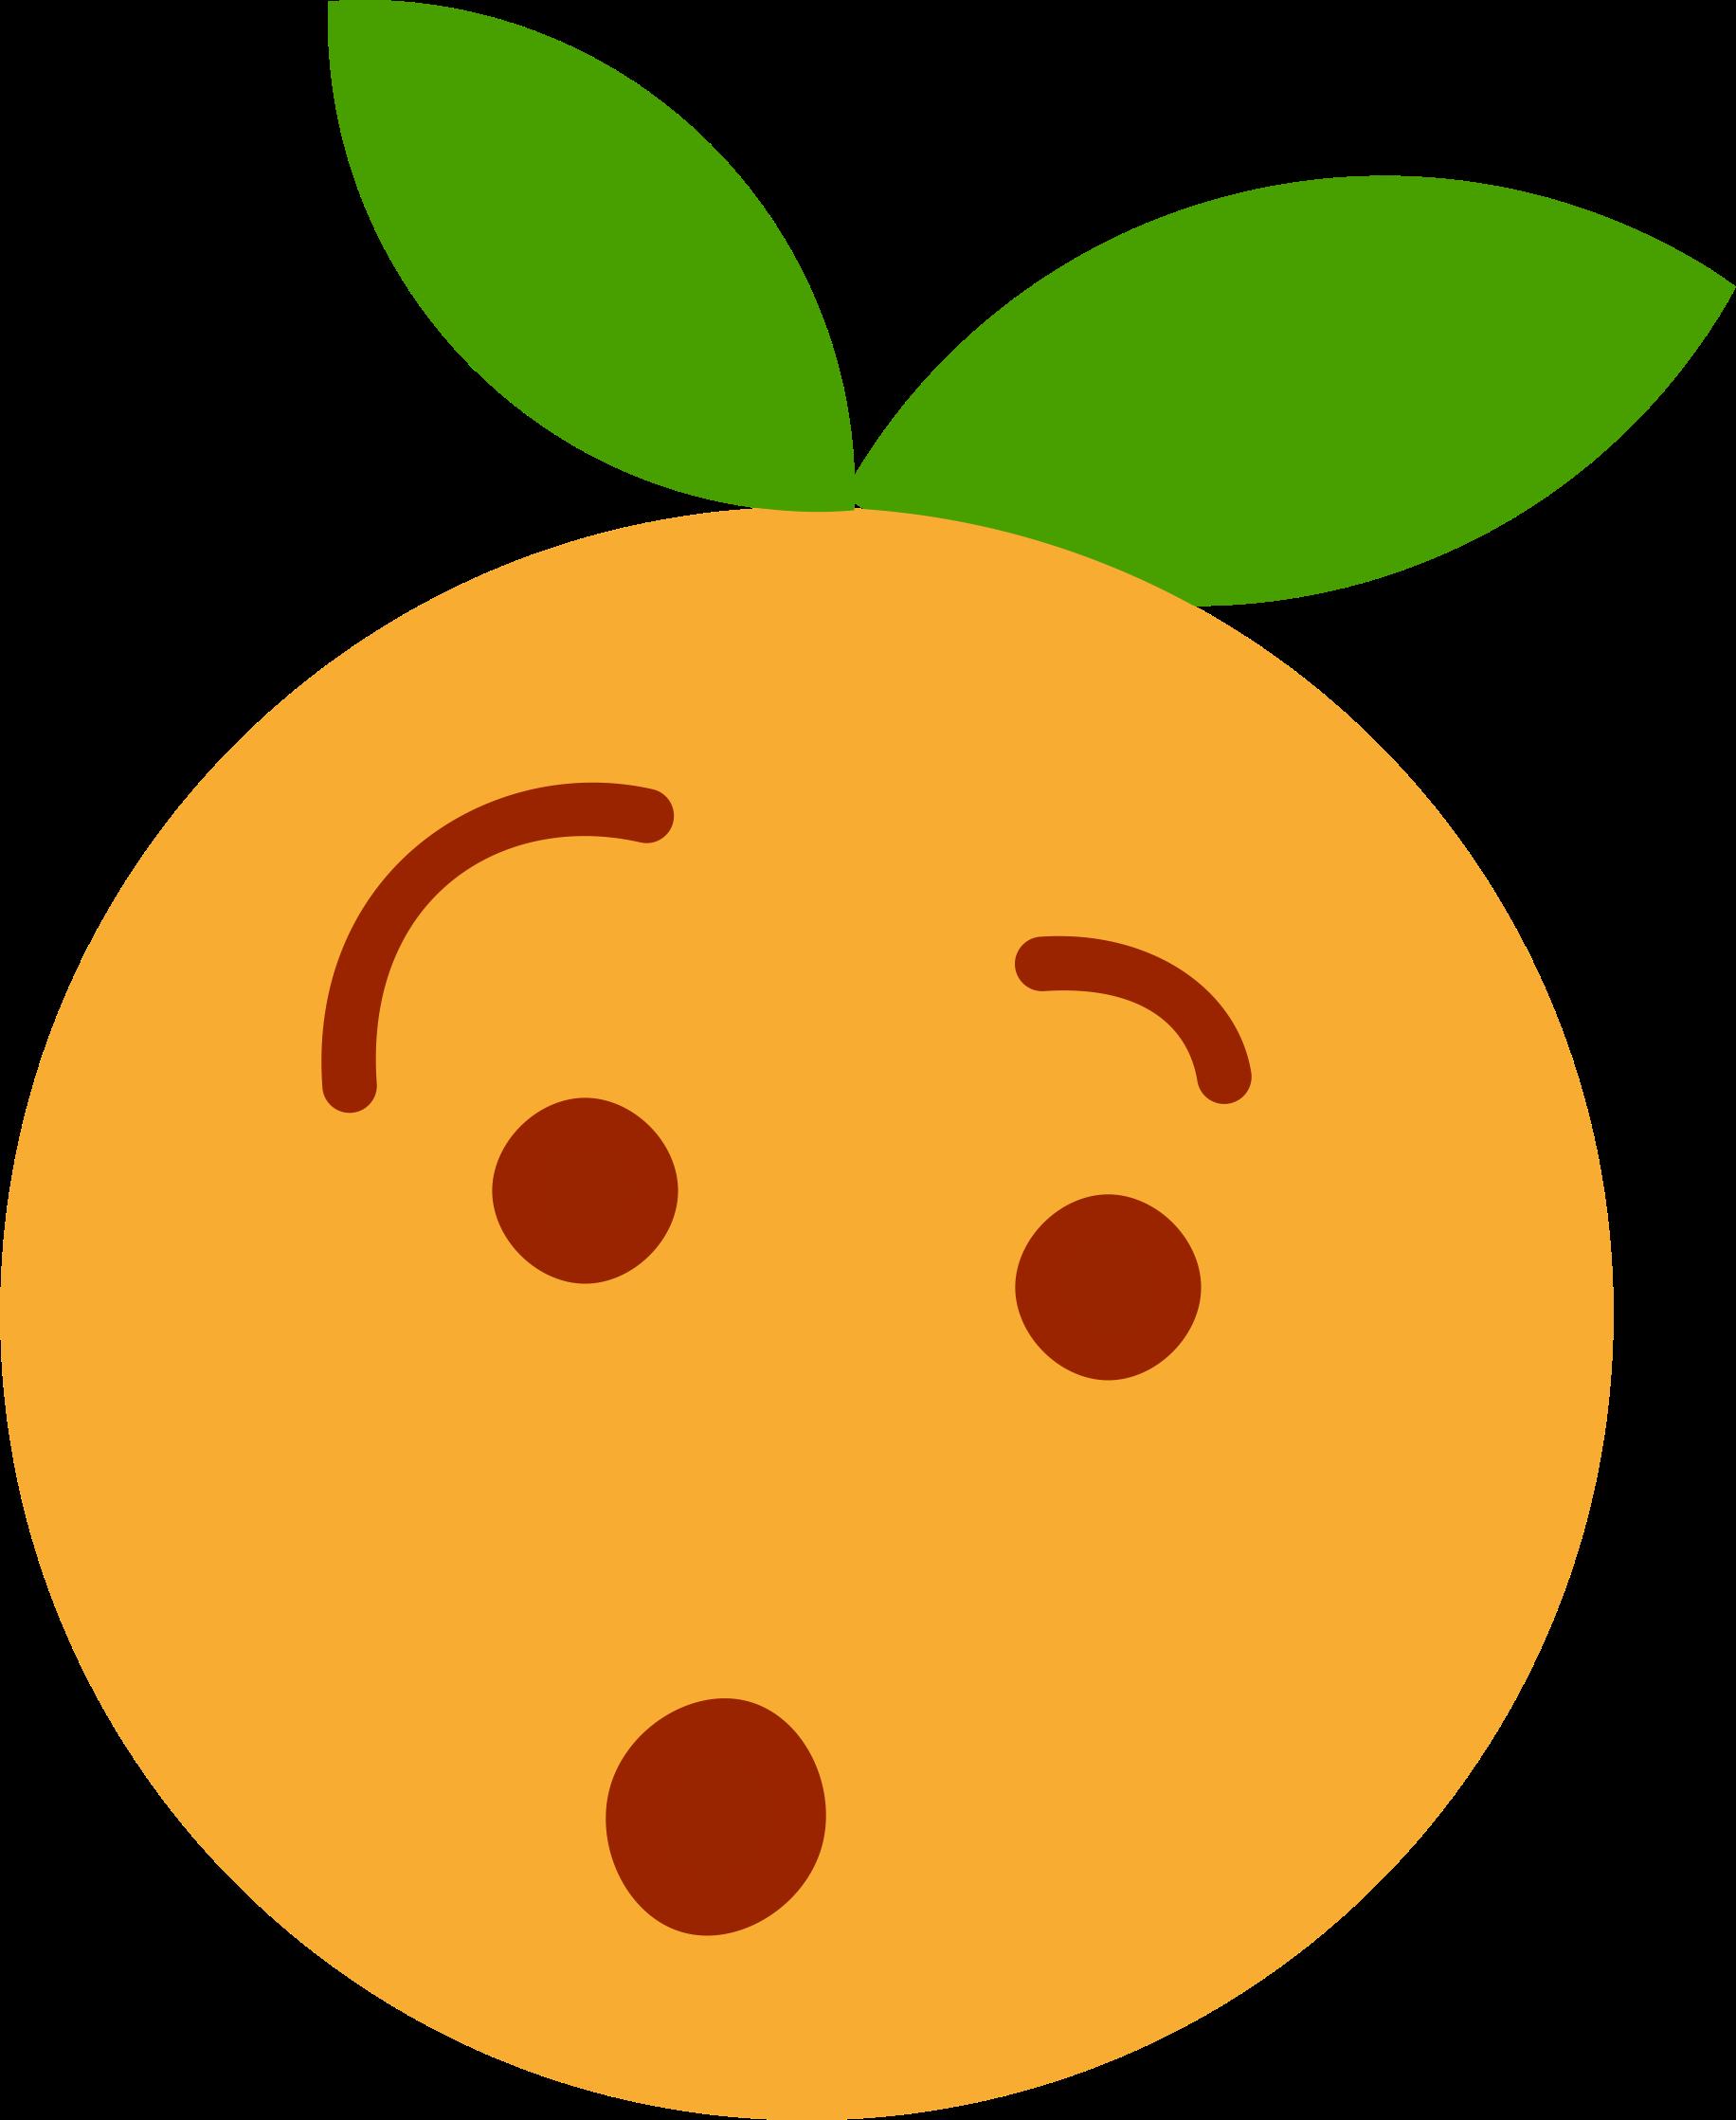 Fruit clipart smiley. Clem euh big image